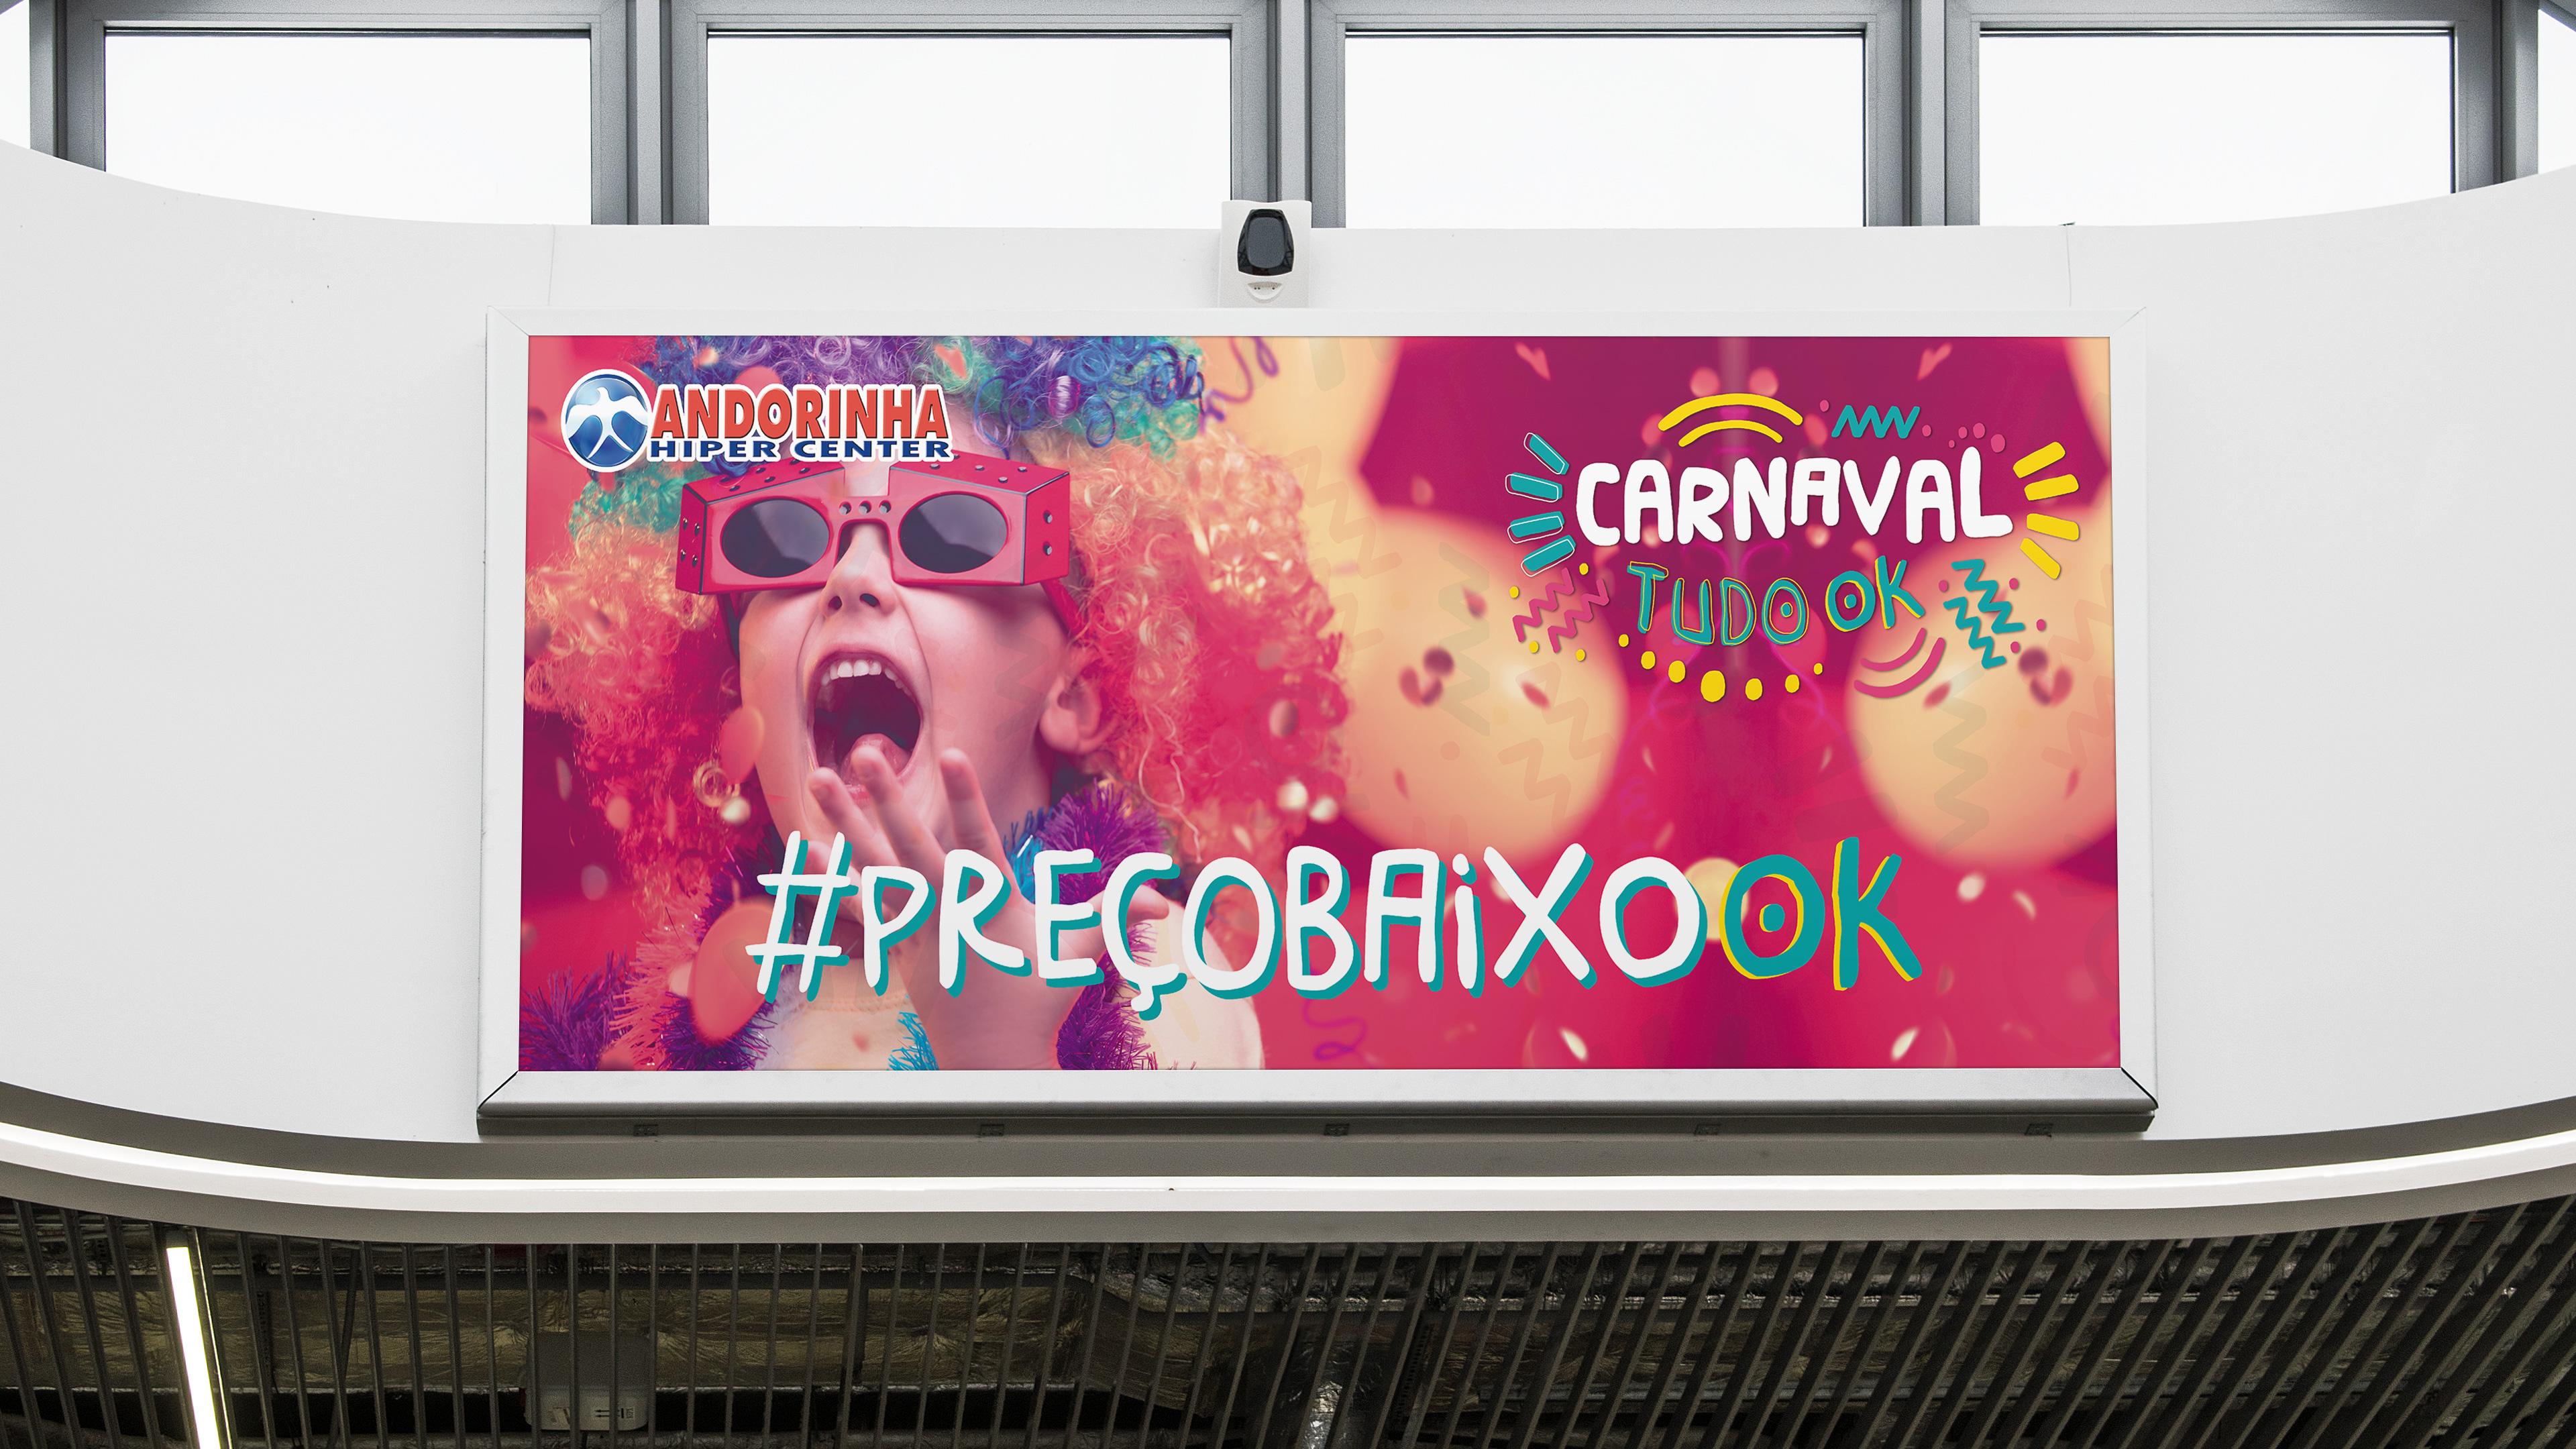 Carnaval-2020-banner-02